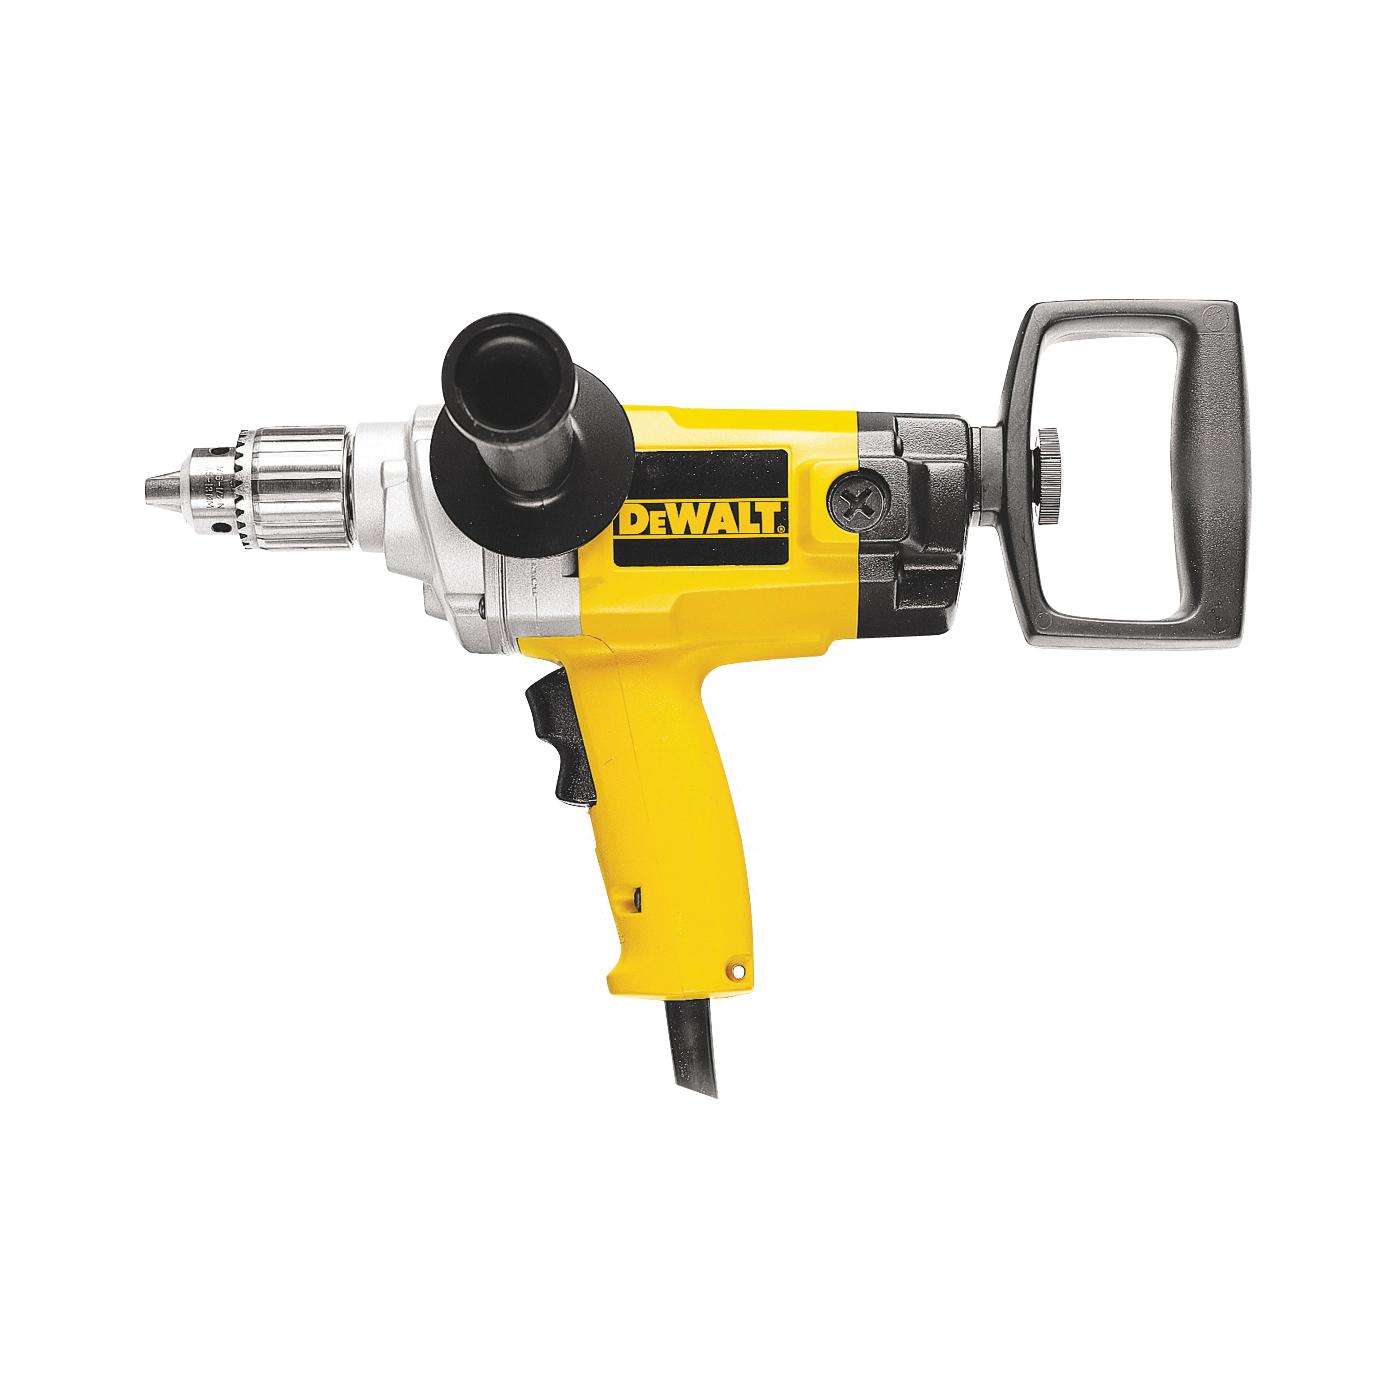 Picture of DeWALT DW130V Electric Drill, 120 V, 600 W, 1-1/2 in Auger Bit, 1/2 in Twist Bit, 3 in Hole Saw Bit Drilling